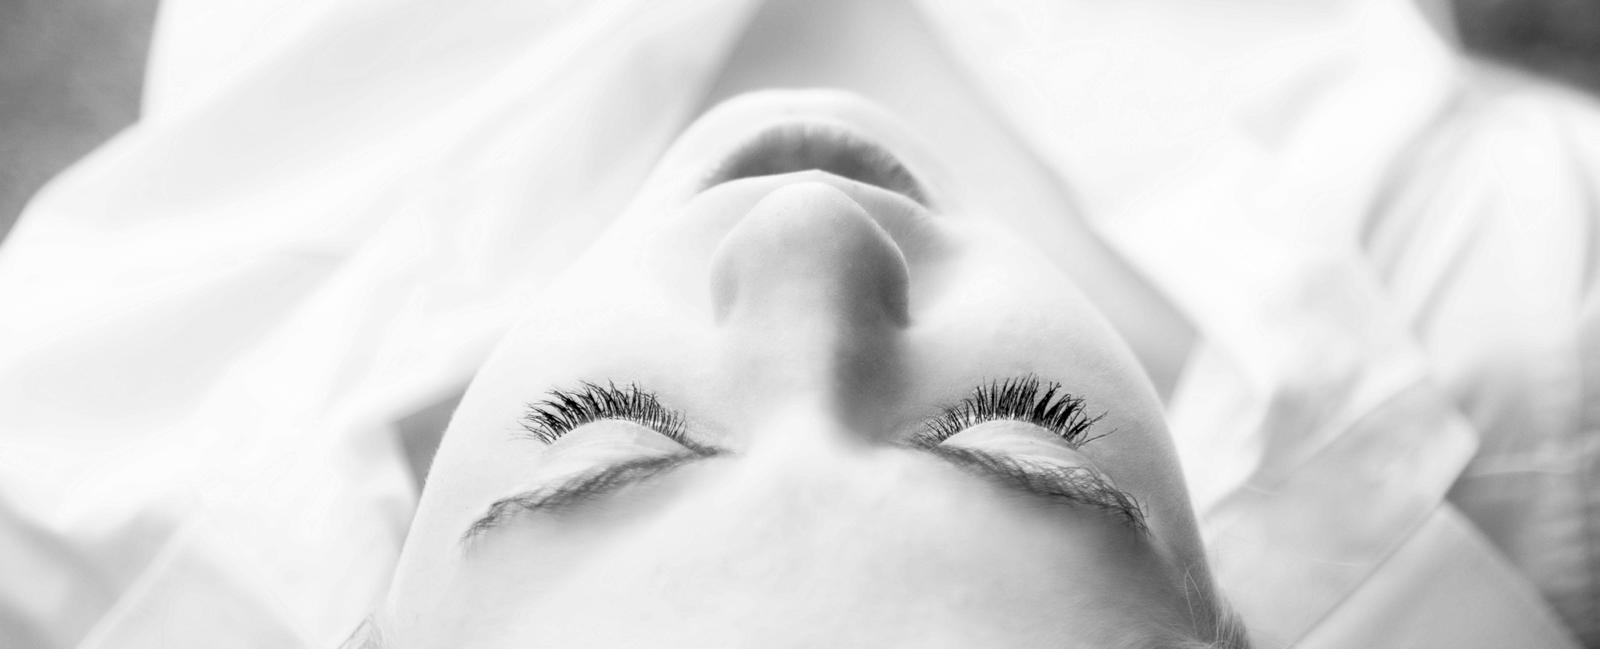 © BMfoto